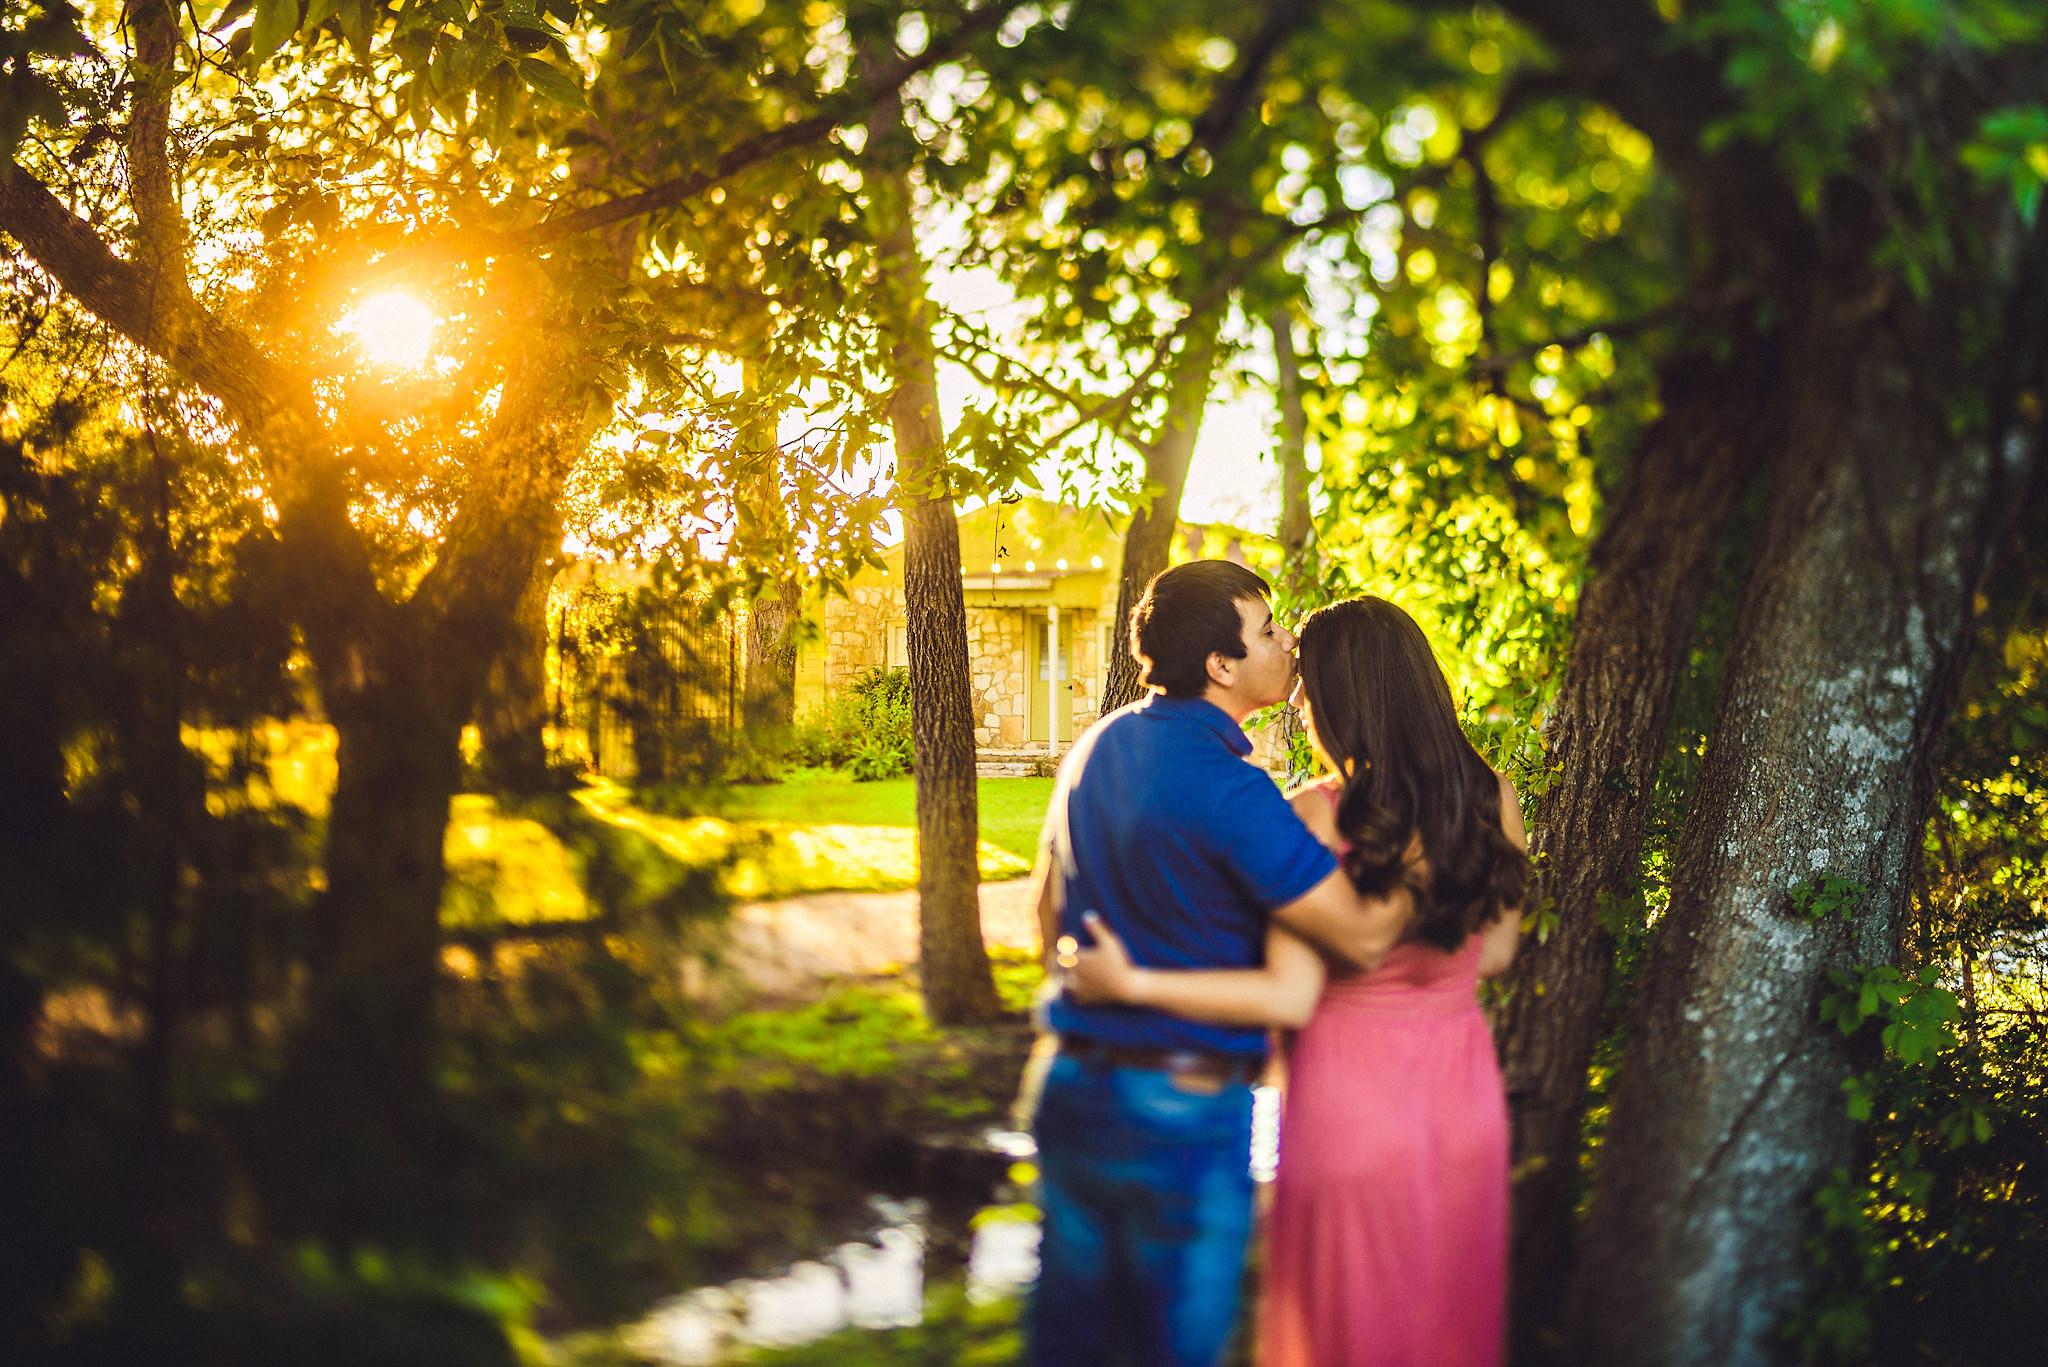 Eirik Halvorsen Austin Texas maternity photographer-13.jpg